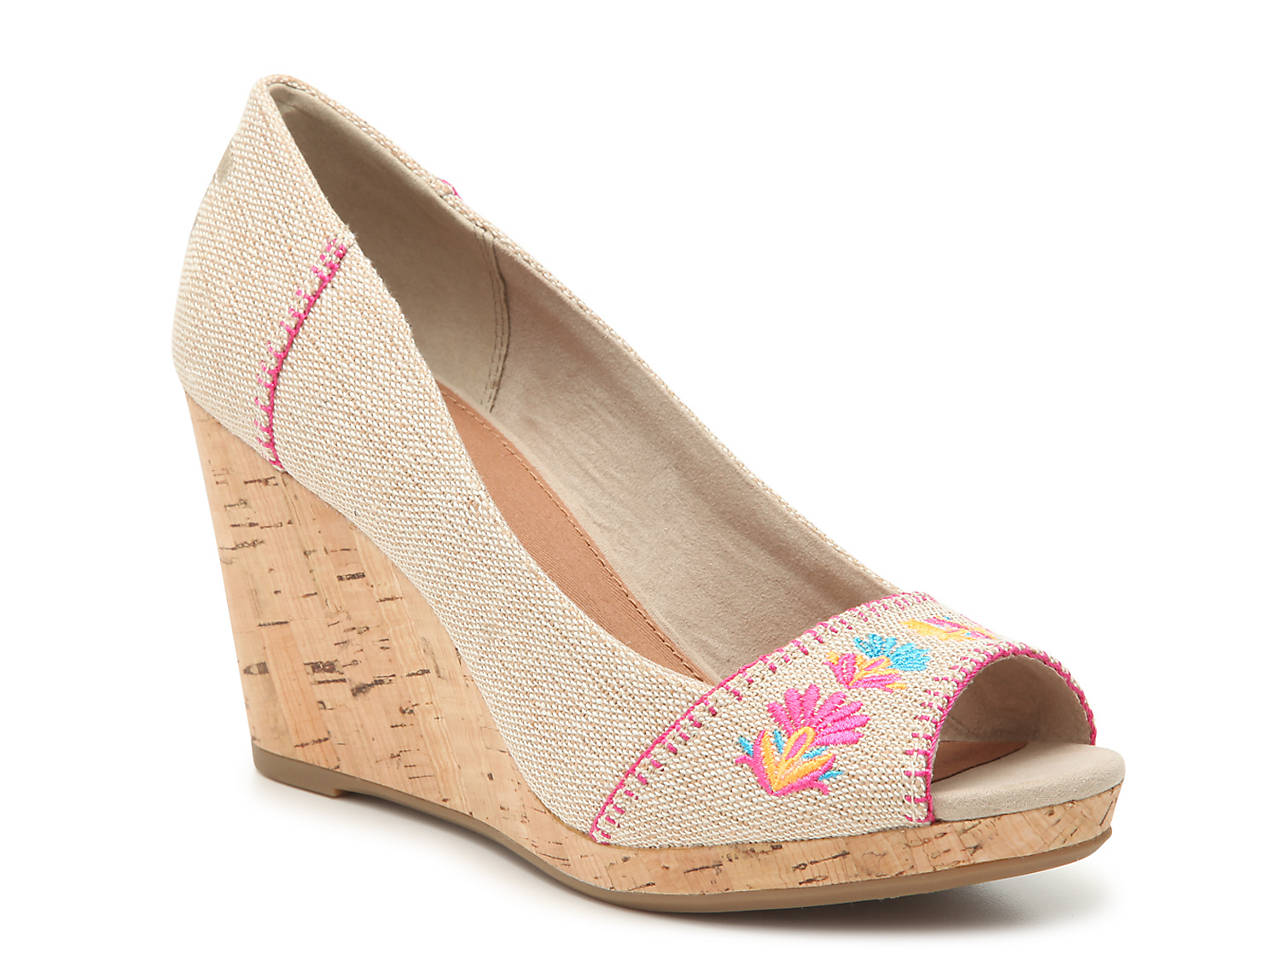 433b2a61f83 TOMS Stella Wedge Pump Women s Shoes